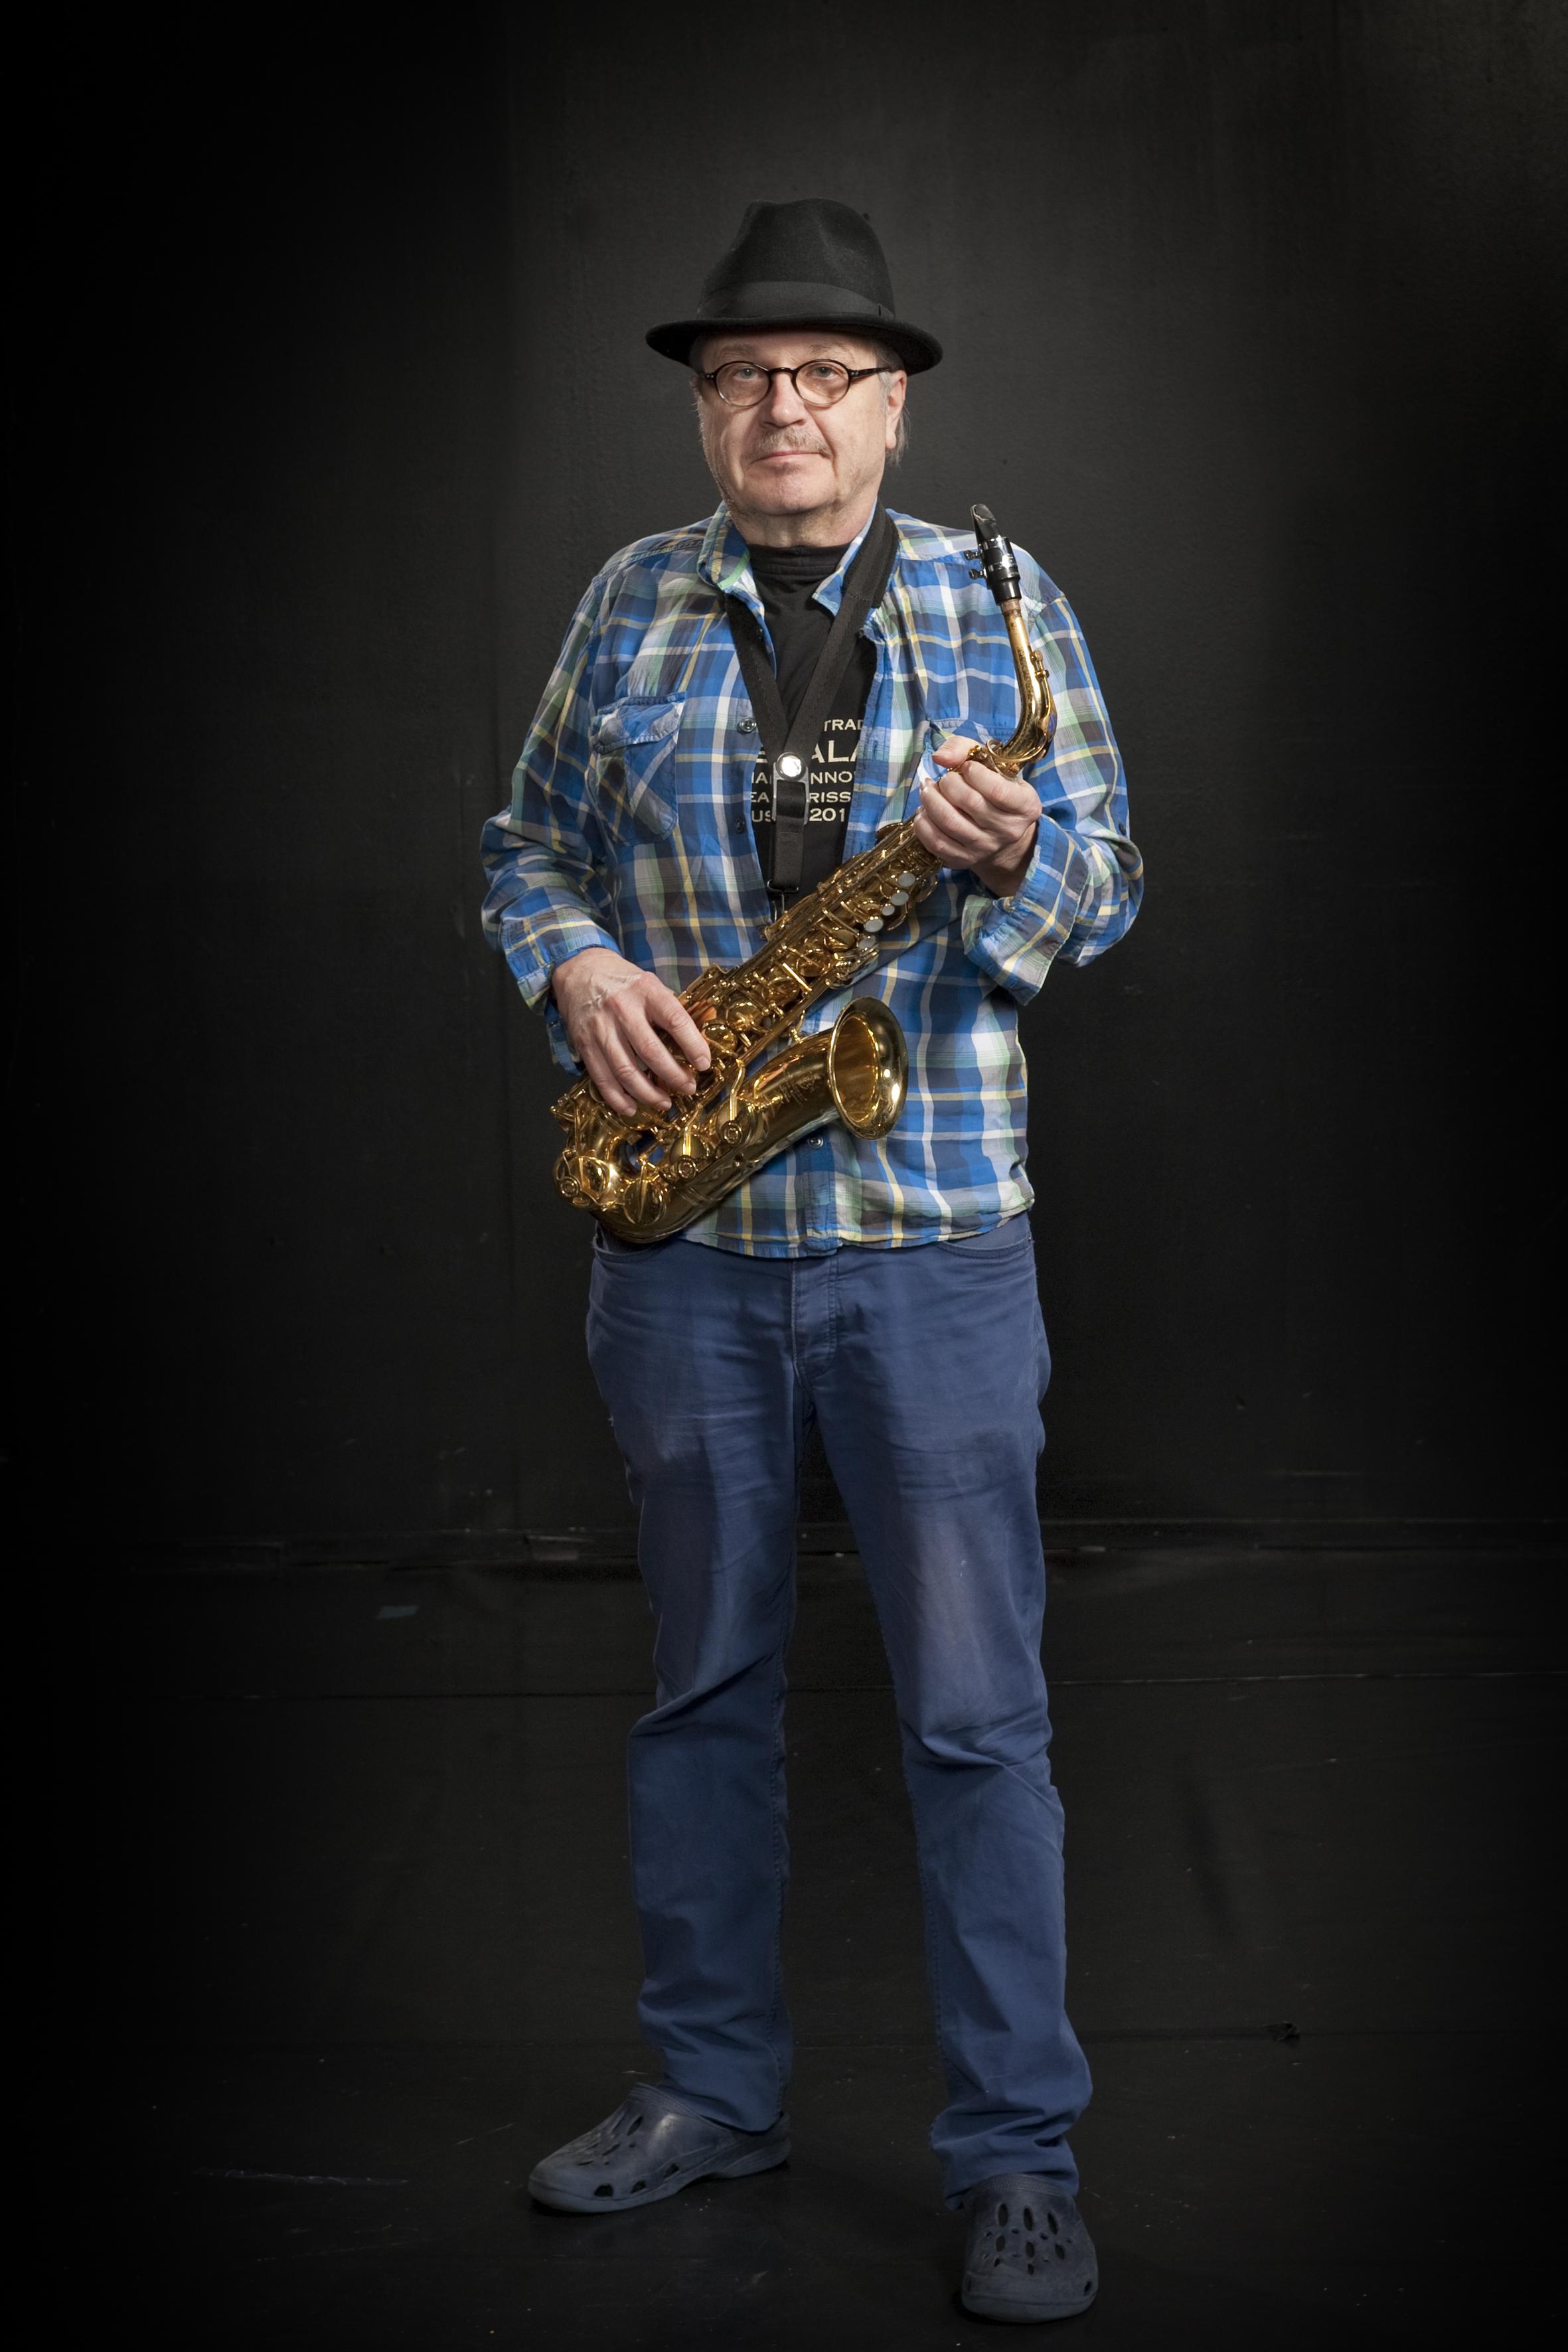 Lassi Talasmo : Bändilinjan opettaja: saksofonit, klarinetti